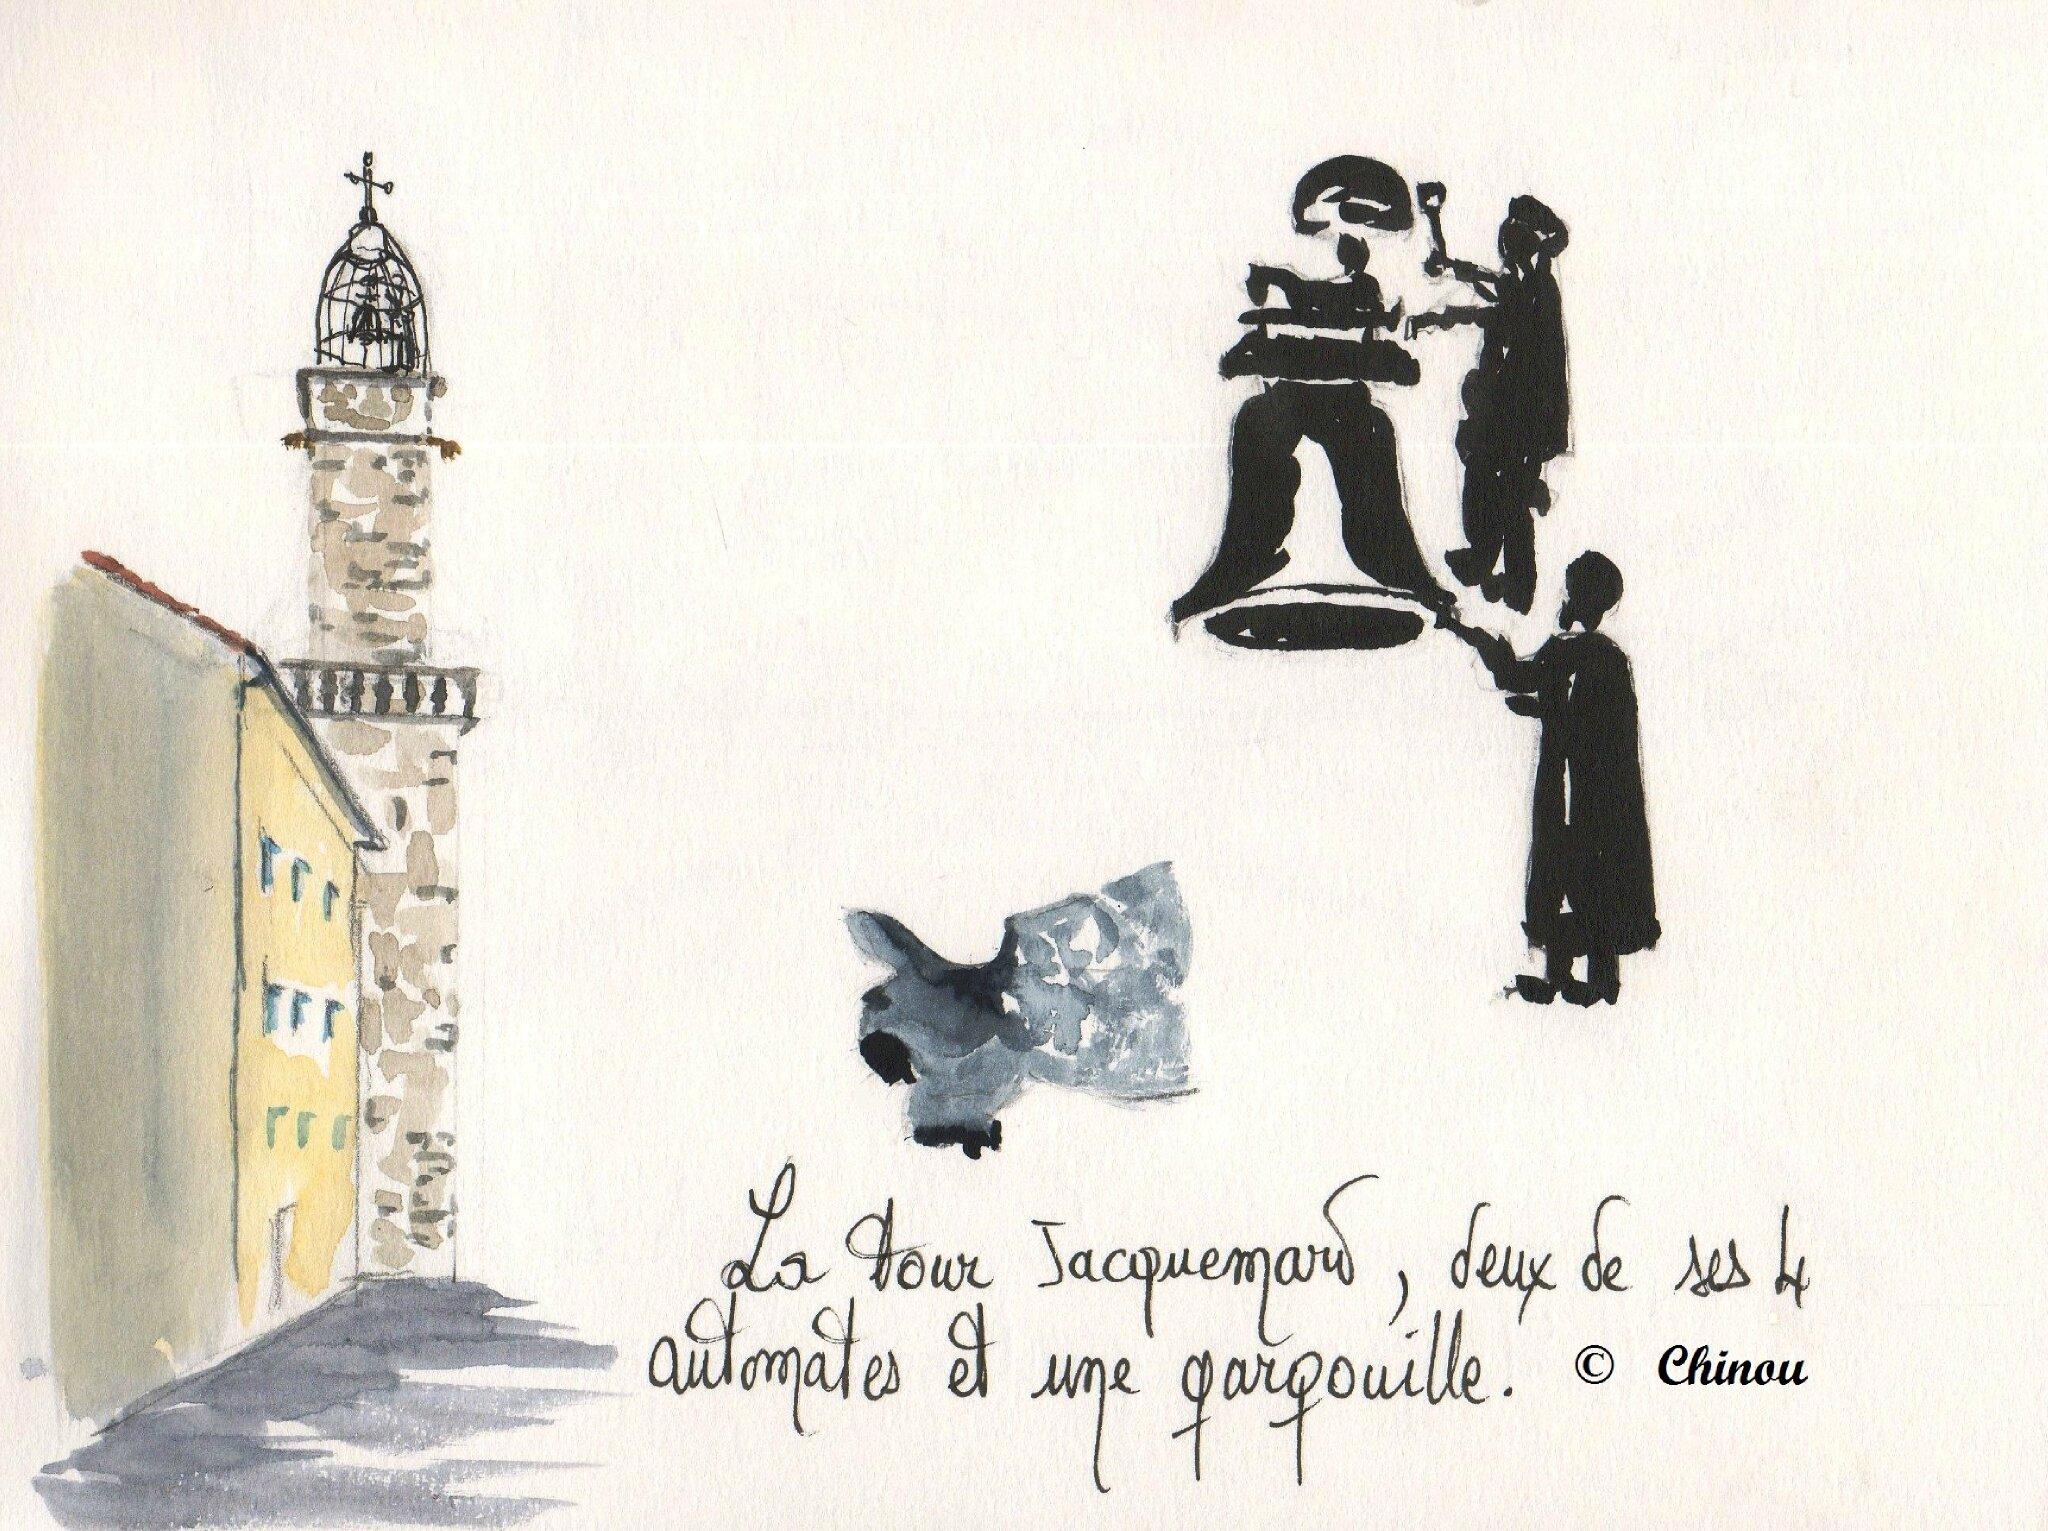 Lambesc Jacquemard